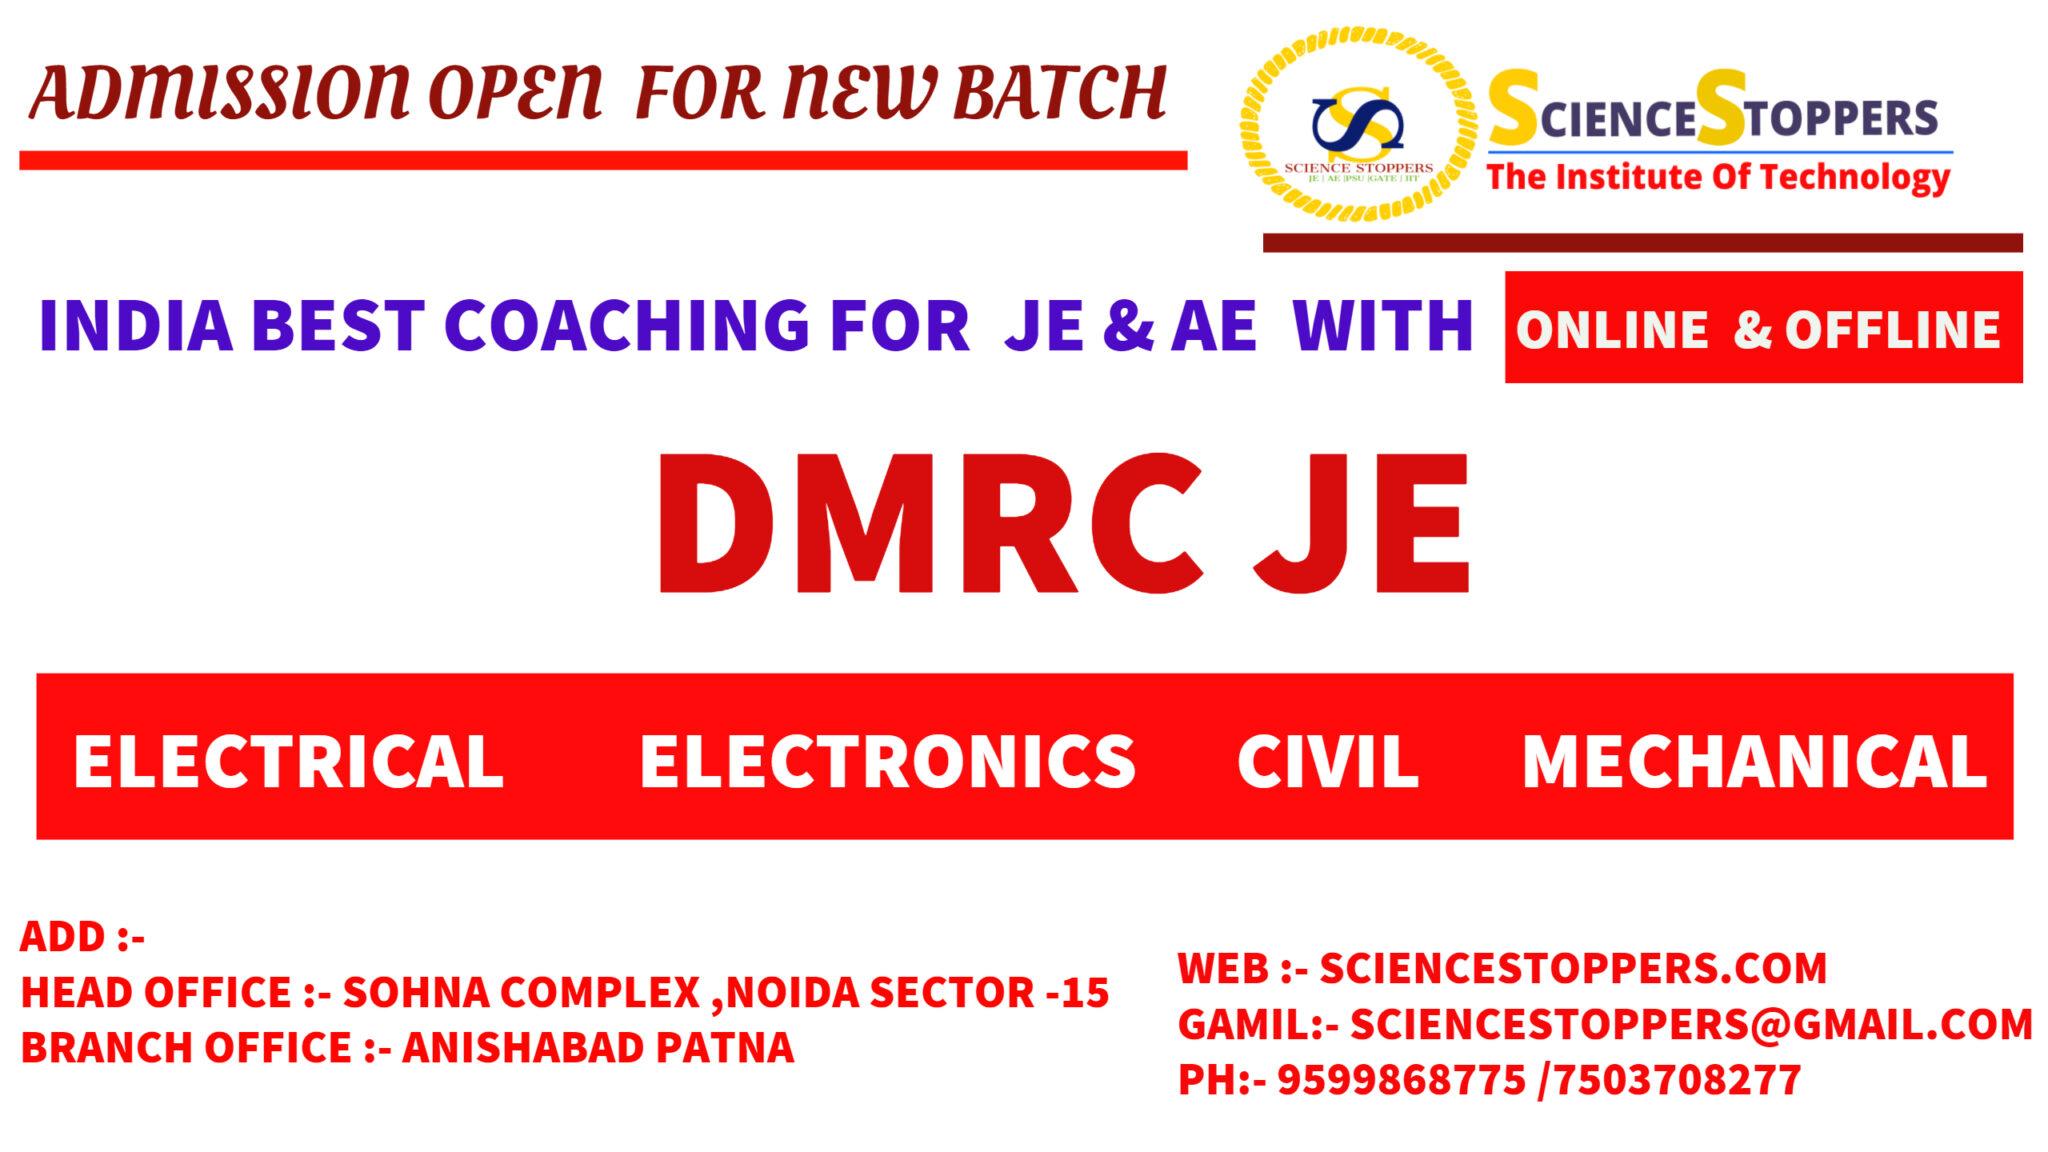 DMRC JE NEW